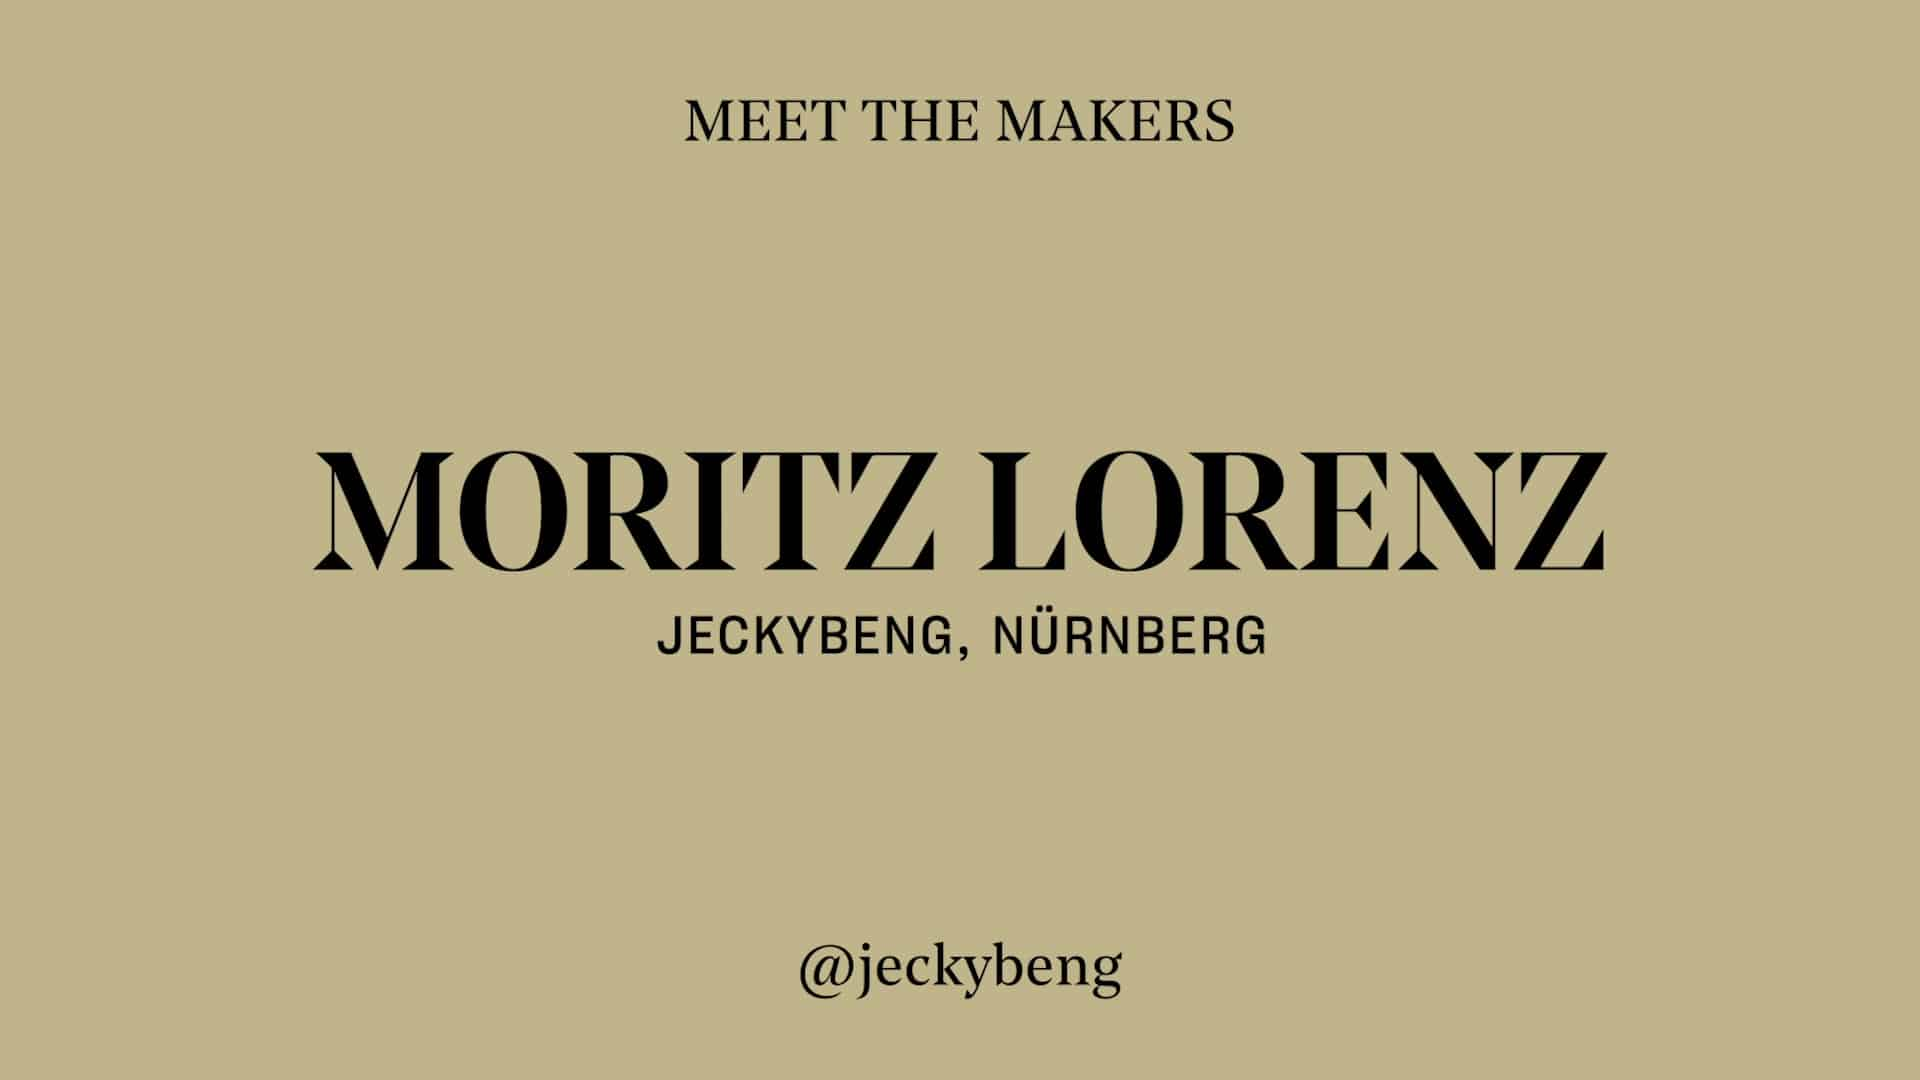 Moritz Lorenz Jeckybeng